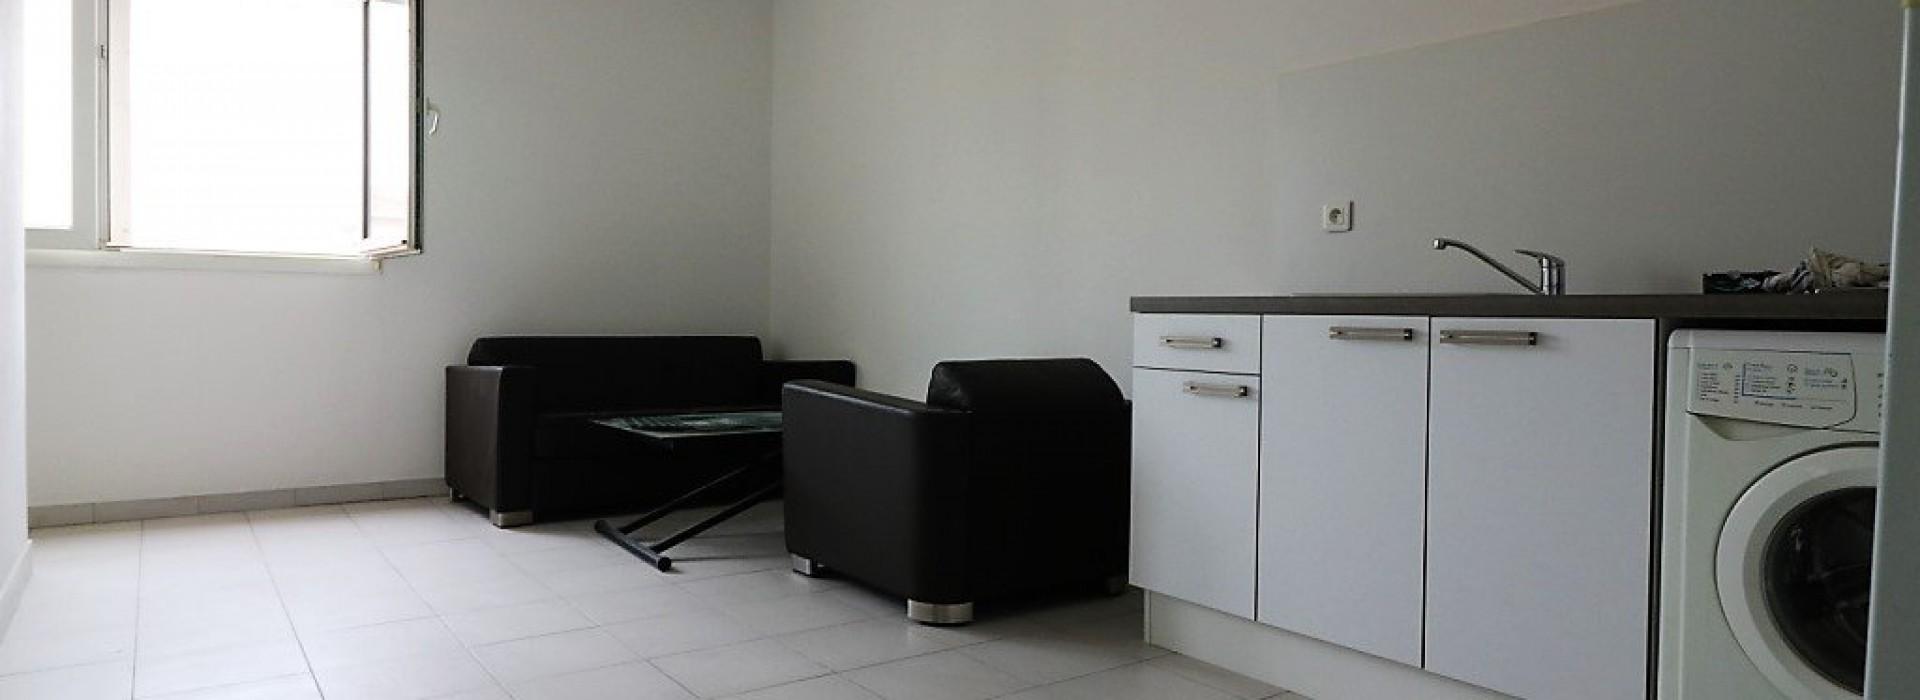 Appartement Nice 1 Pièce 31m2 85,000€